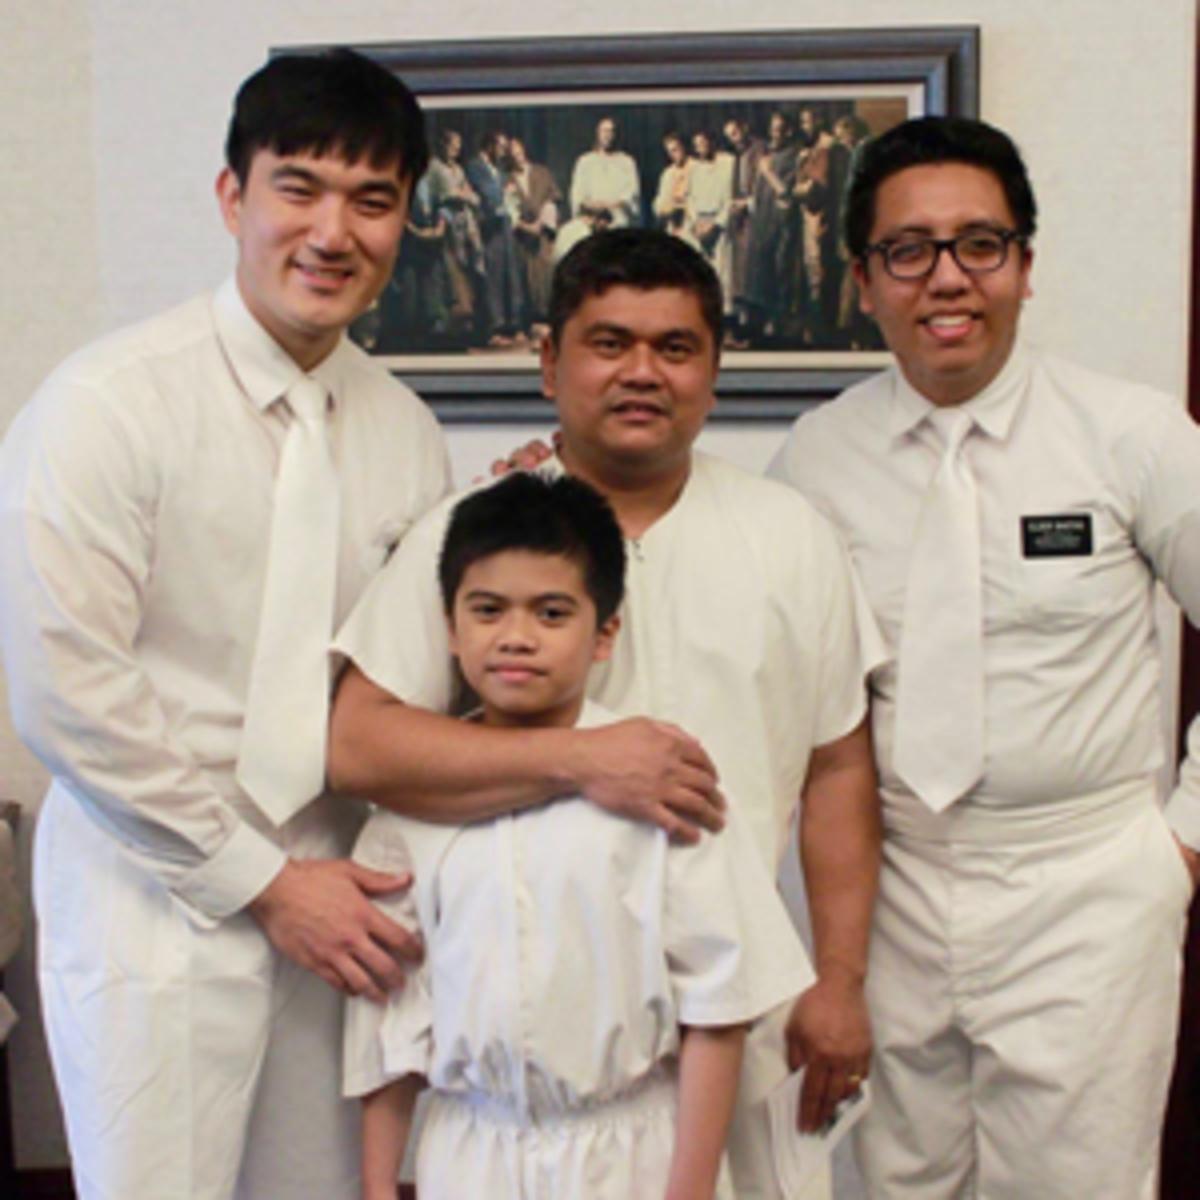 Baluyot family